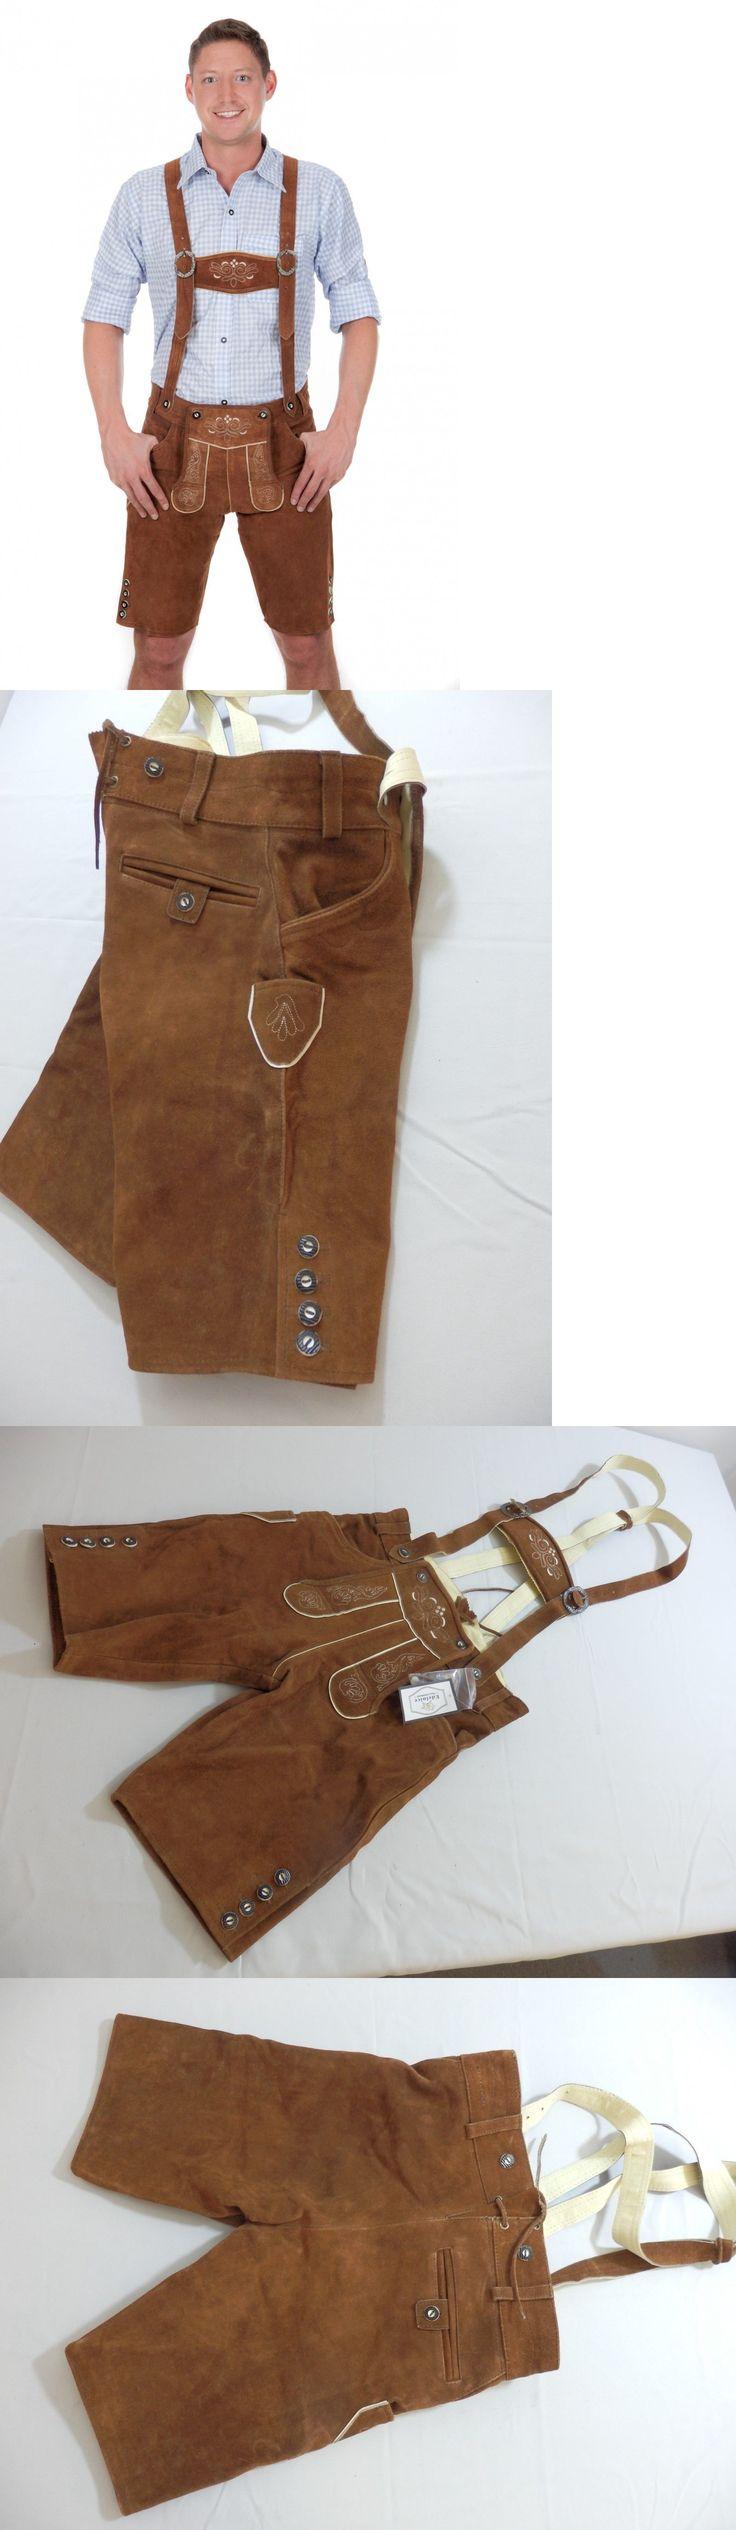 Lederhosen 163144: Edelnice Trachtenmode Short Braid Lederhose Trousers Chestnut Brown Nwt 46 -> BUY IT NOW ONLY: $69 on eBay!